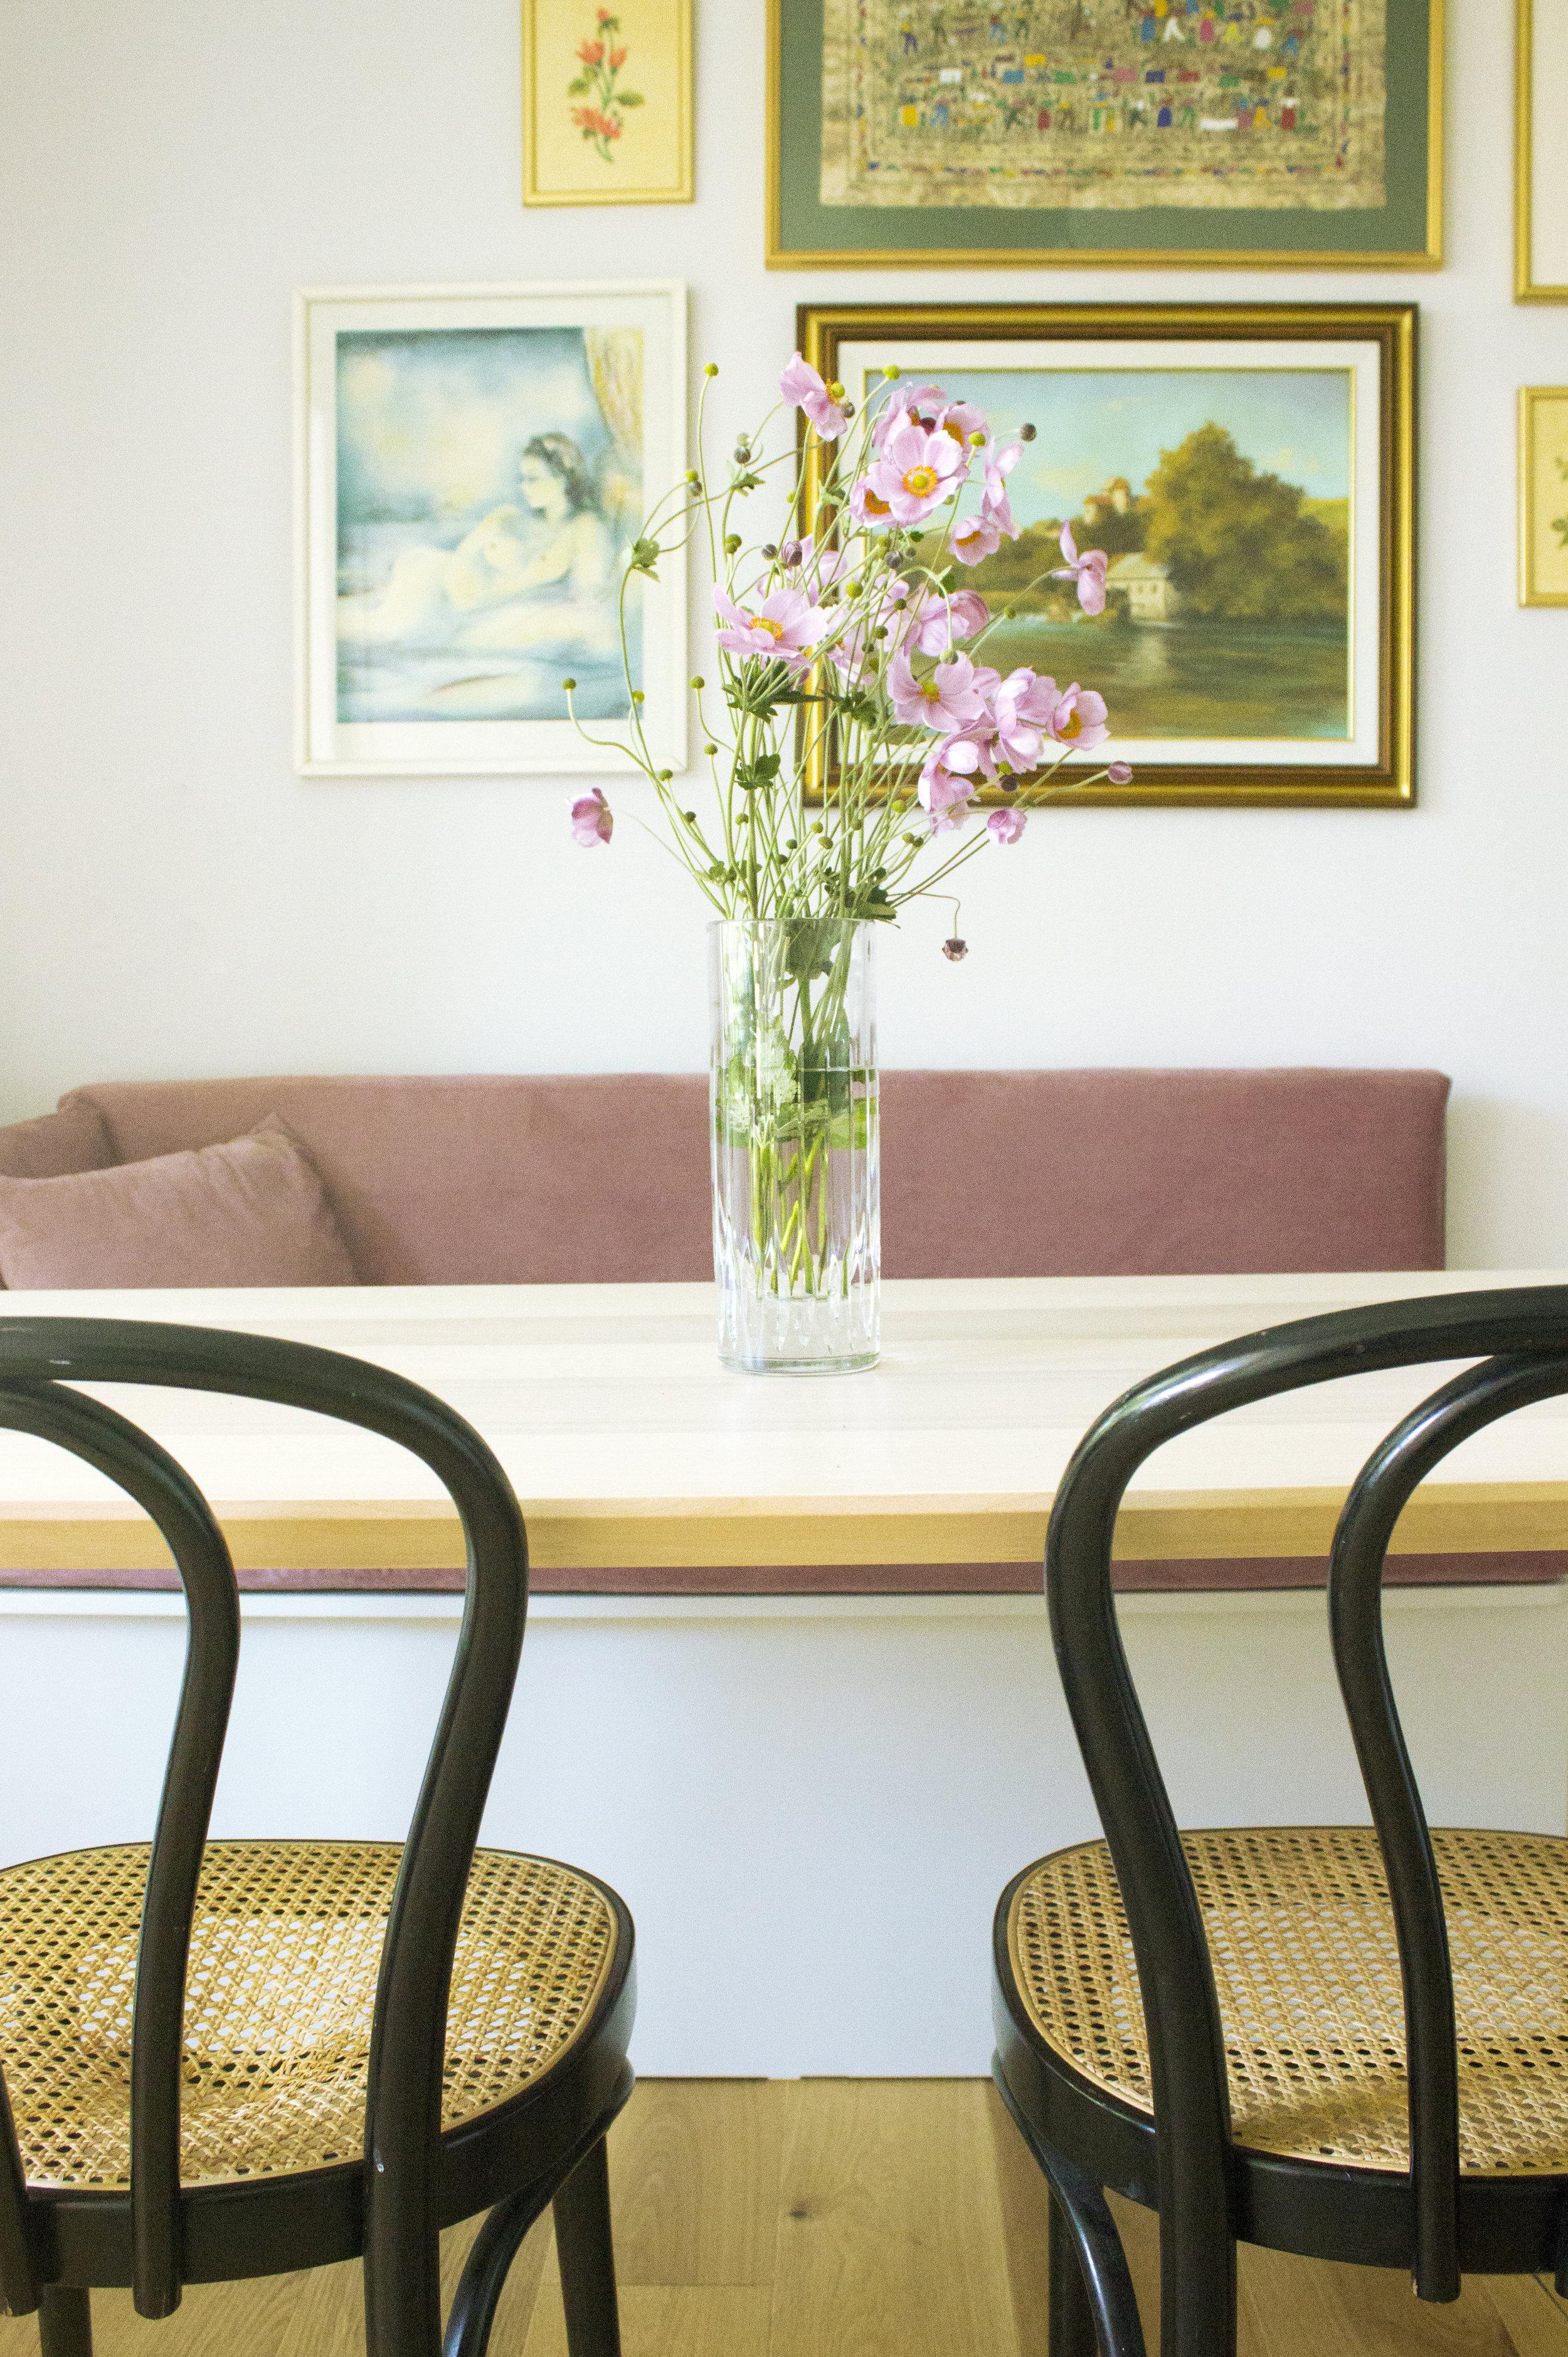 poke studio projekt_ženstvena oaza_kuhinja in jedilnica-1